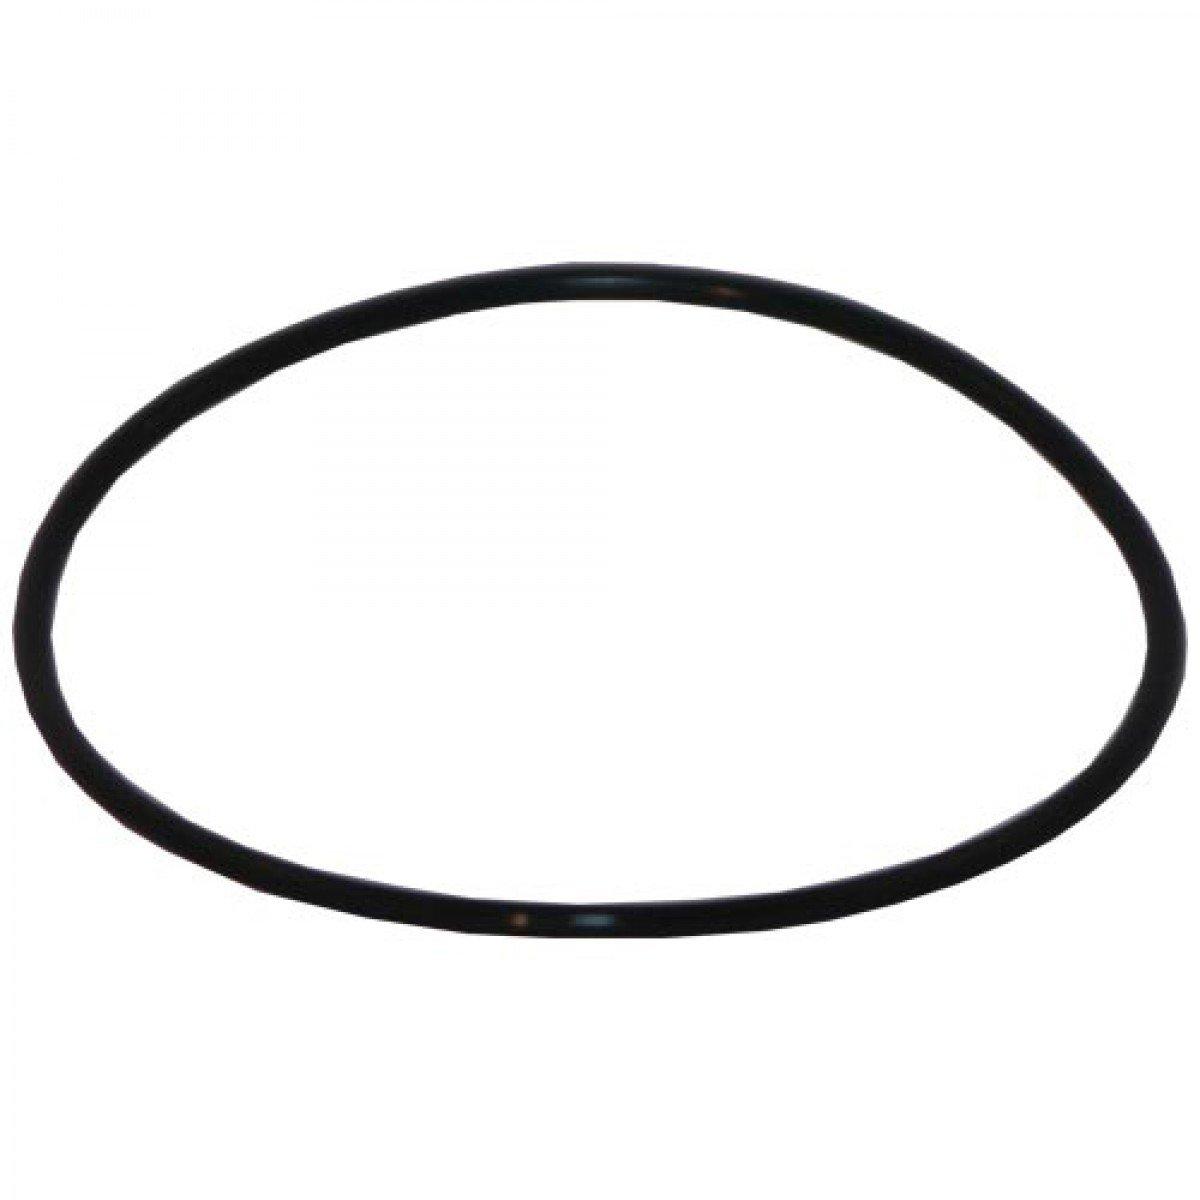 Aqua-Pure 68898-32 Water Filter O-Ring